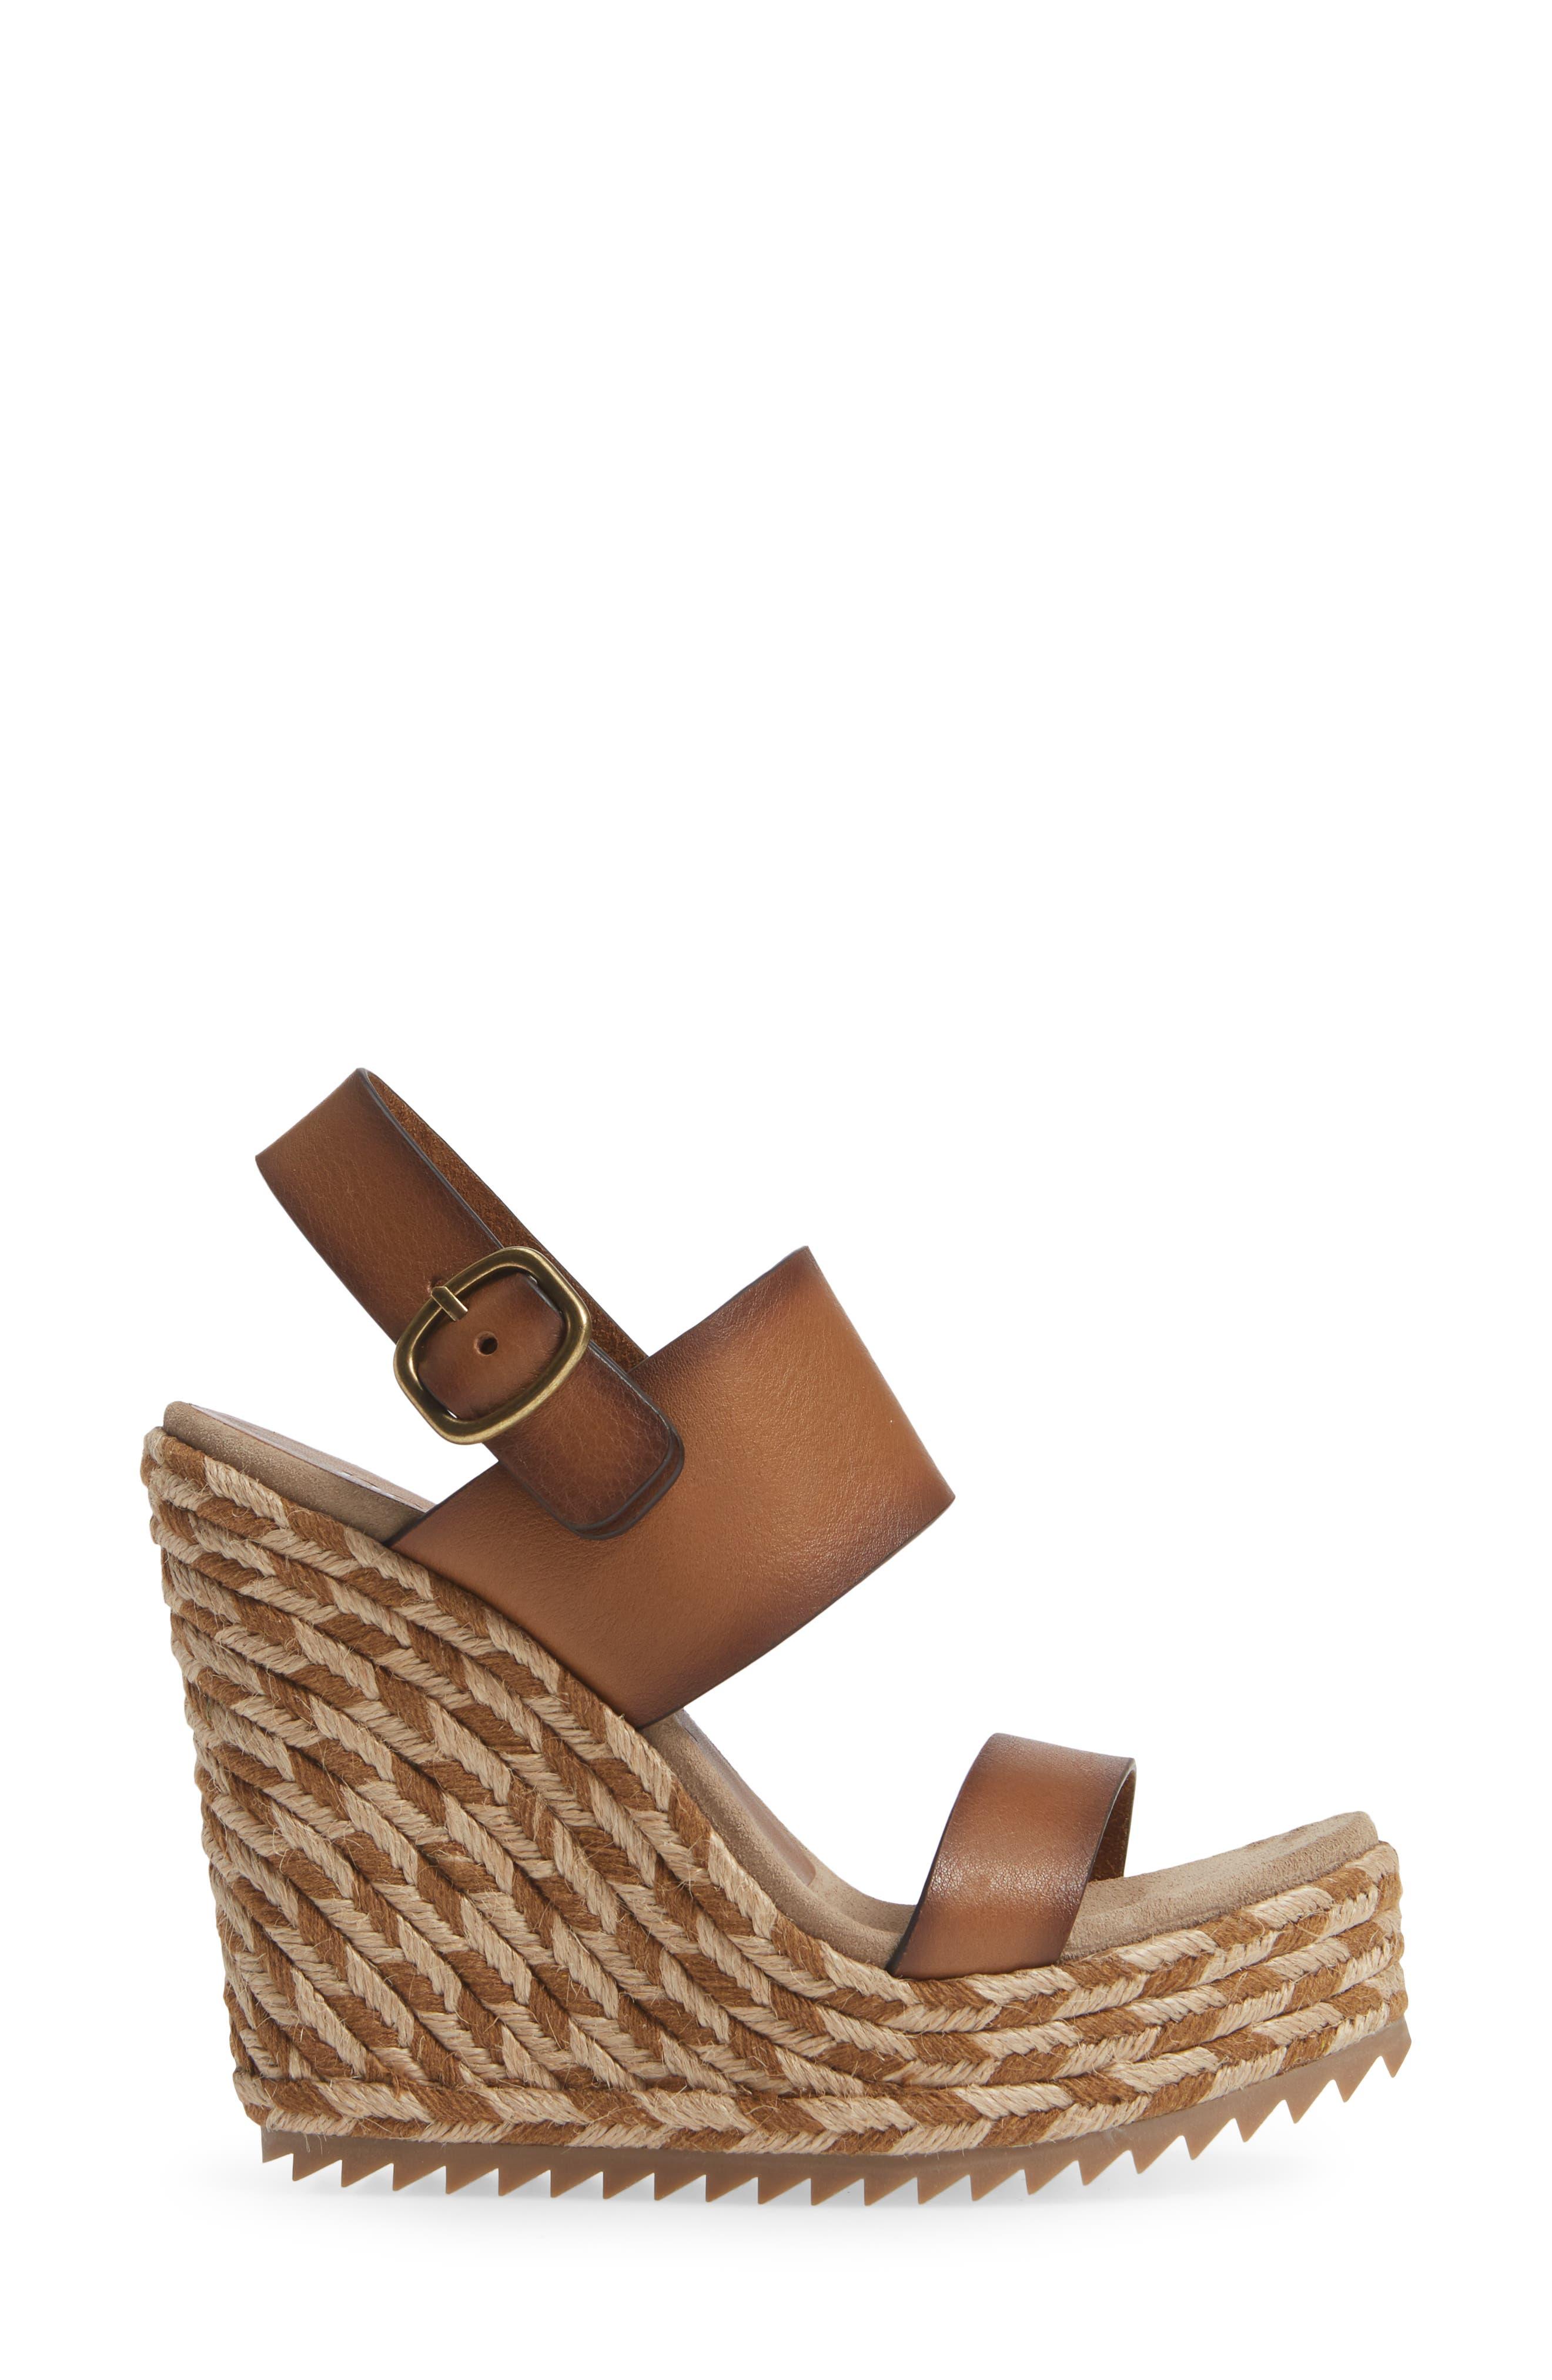 Tait Woven Wedge Sandal,                             Alternate thumbnail 3, color,                             CIGAR VACCHETTA